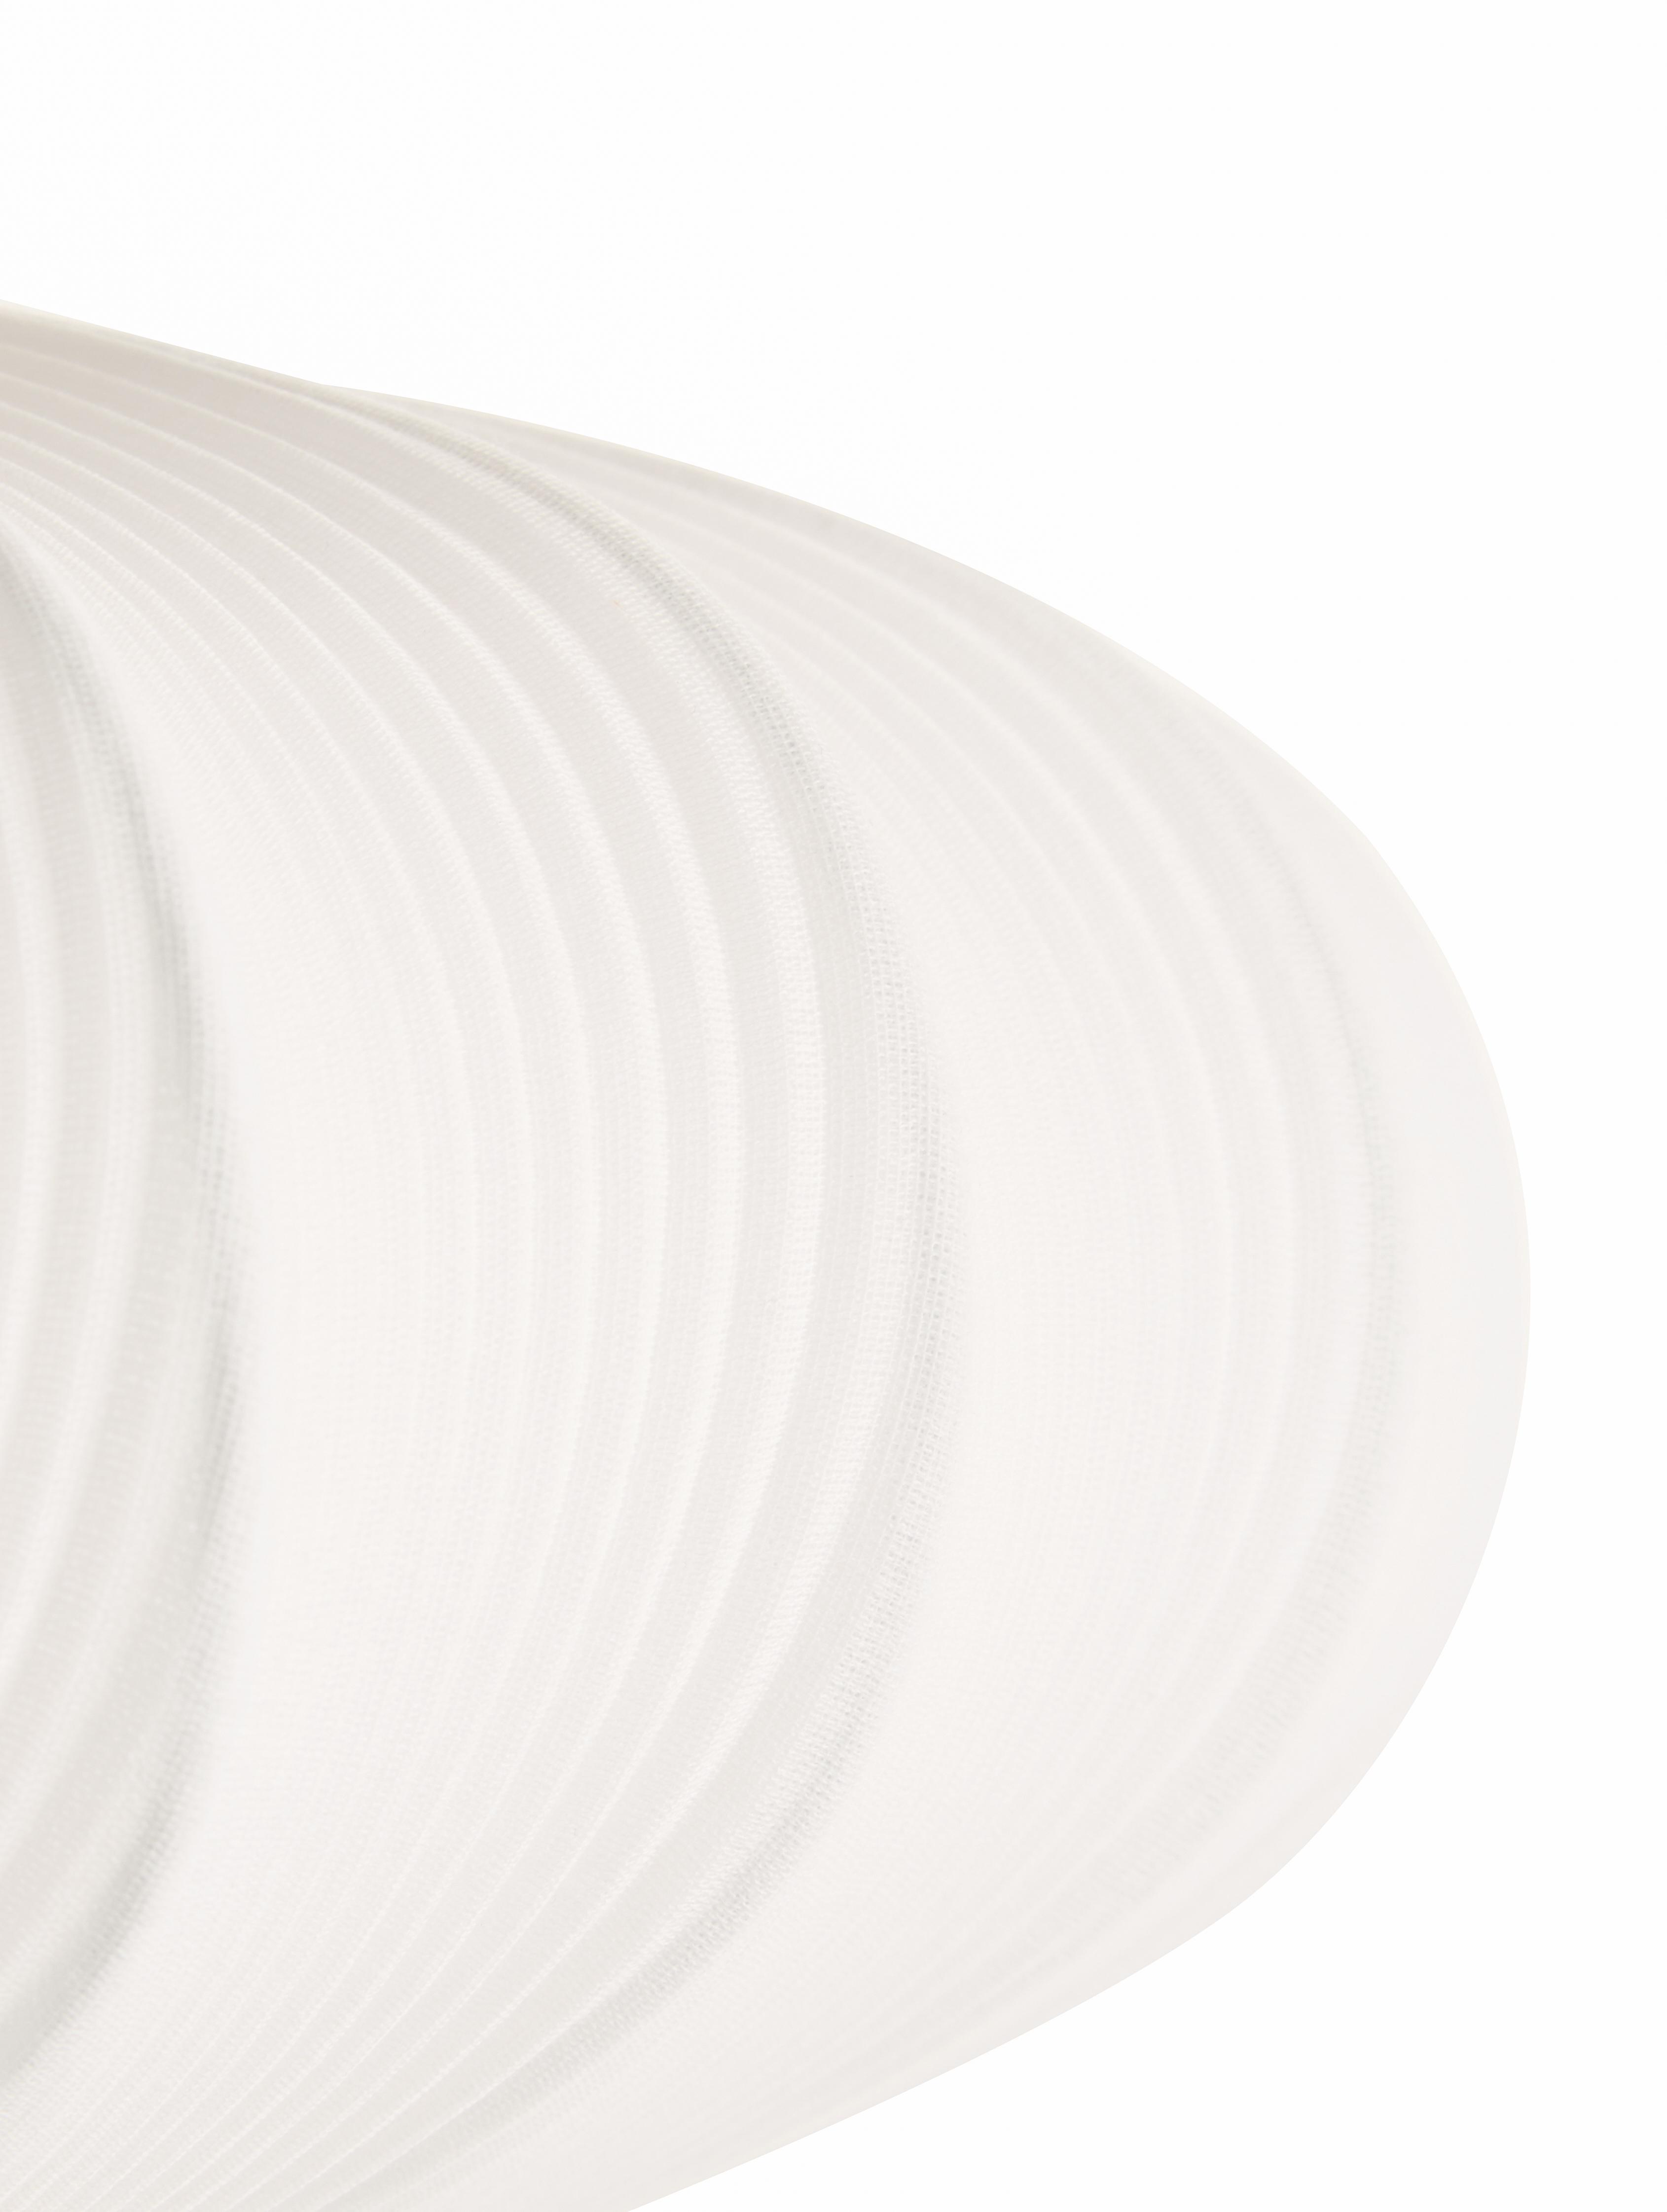 Deckenleuchte Mamsell, Lampenschirm: 60%Polyester, 40%Rayon, Gestell: Metall, Weiß, Ø 55 x H 28 cm